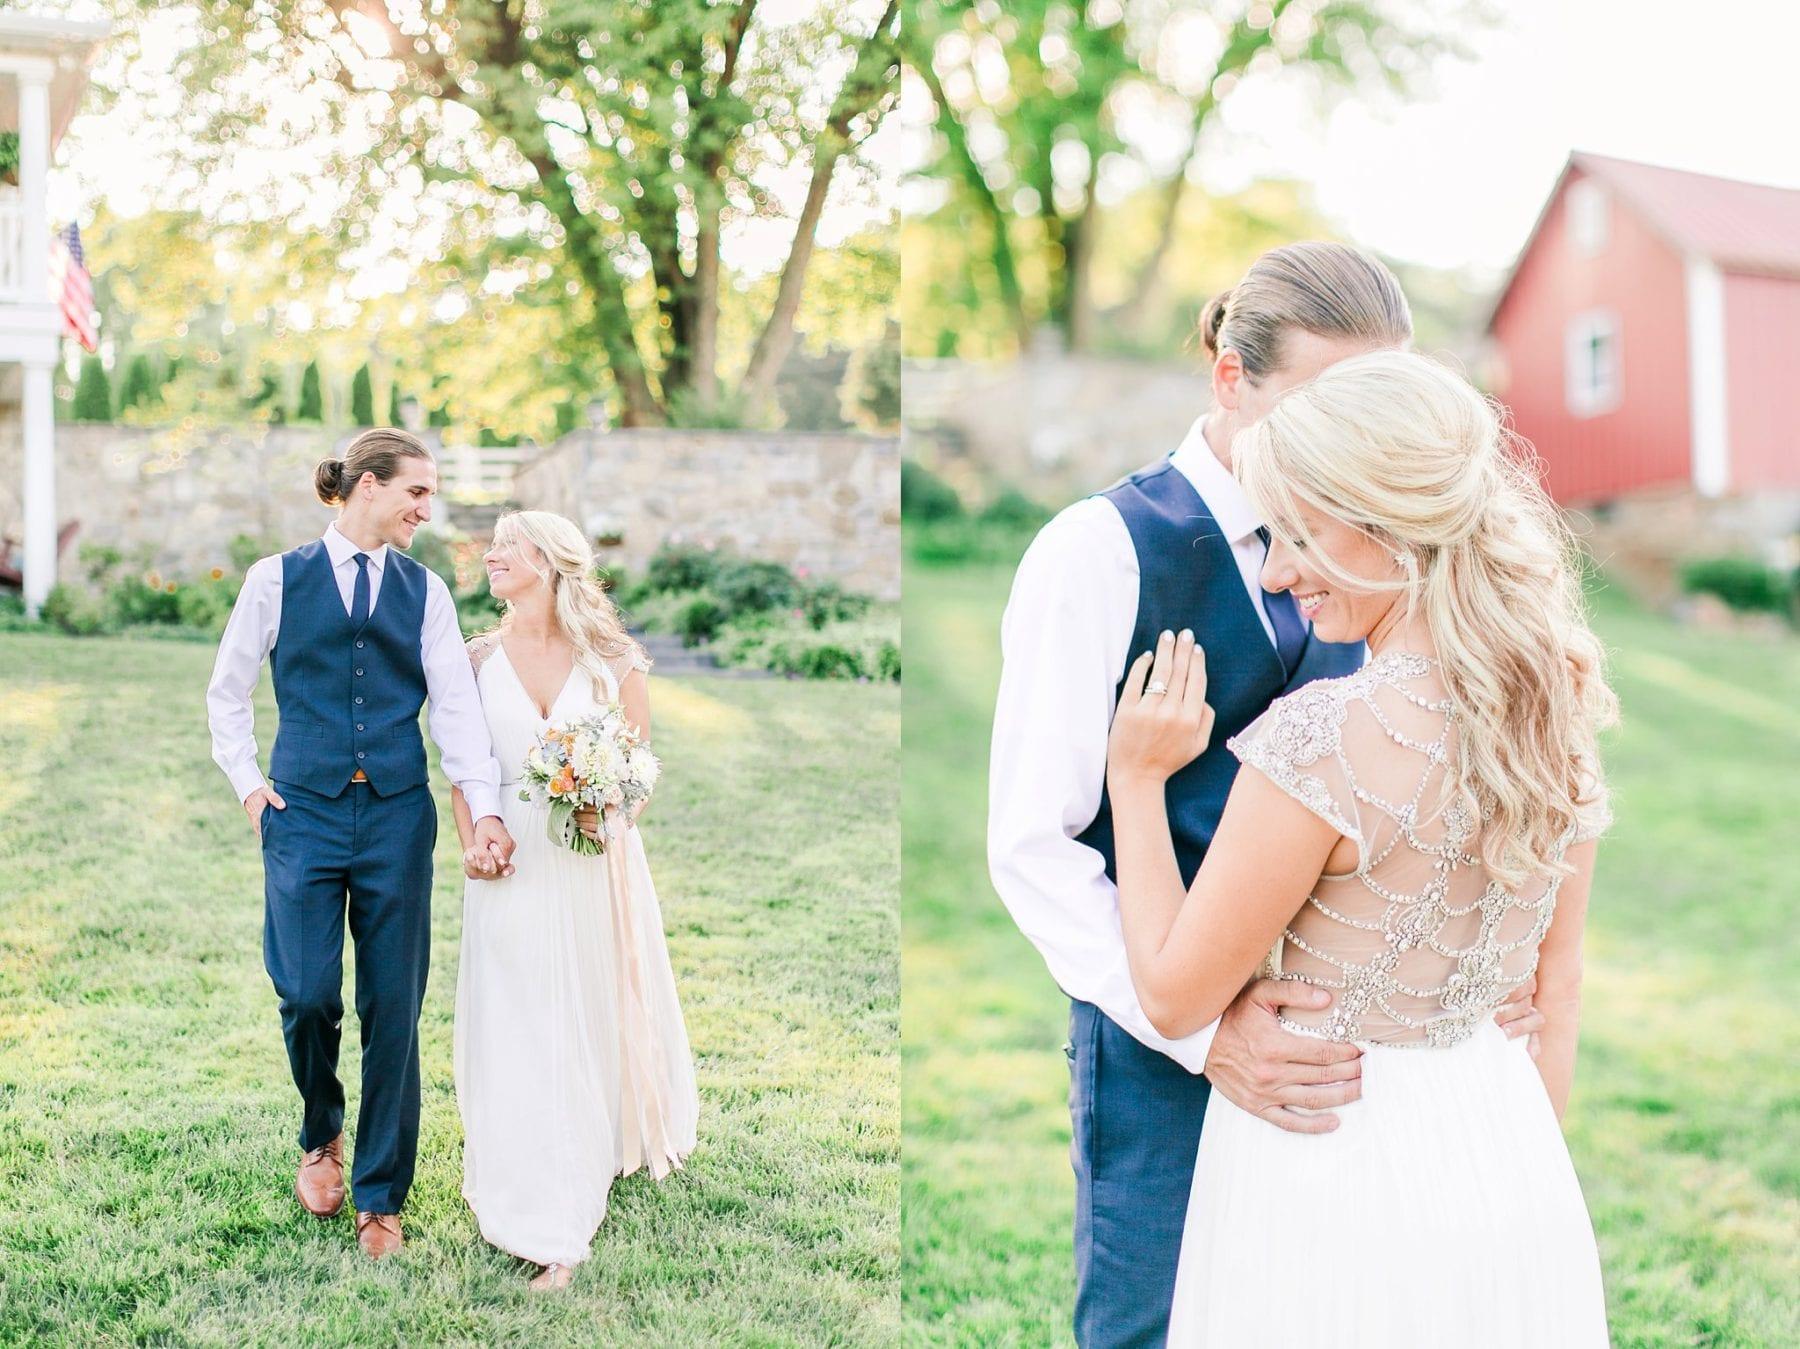 Pond View Farm Wedding Photos Maryland Wedding Photographer Kristen & Ryan Megan Kelsey Photography Blog-239.jpg